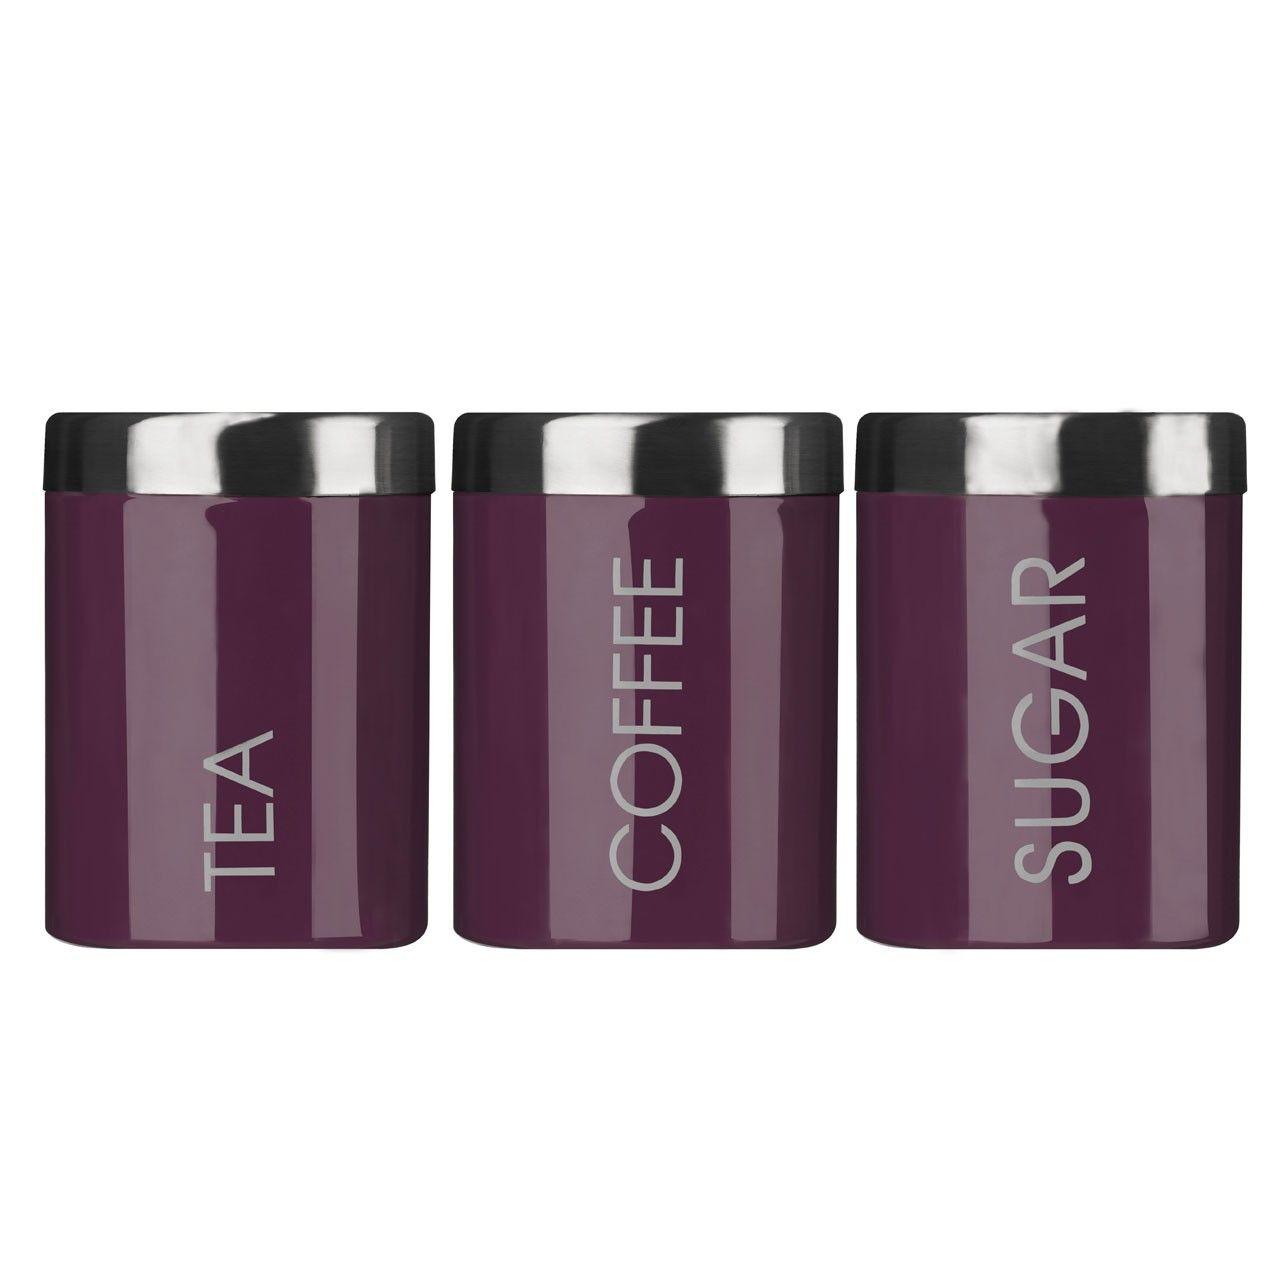 Tea Coffee U0026 Sugar Kitchen Pots/Canisters/jars Set Of 3 Purple Colour